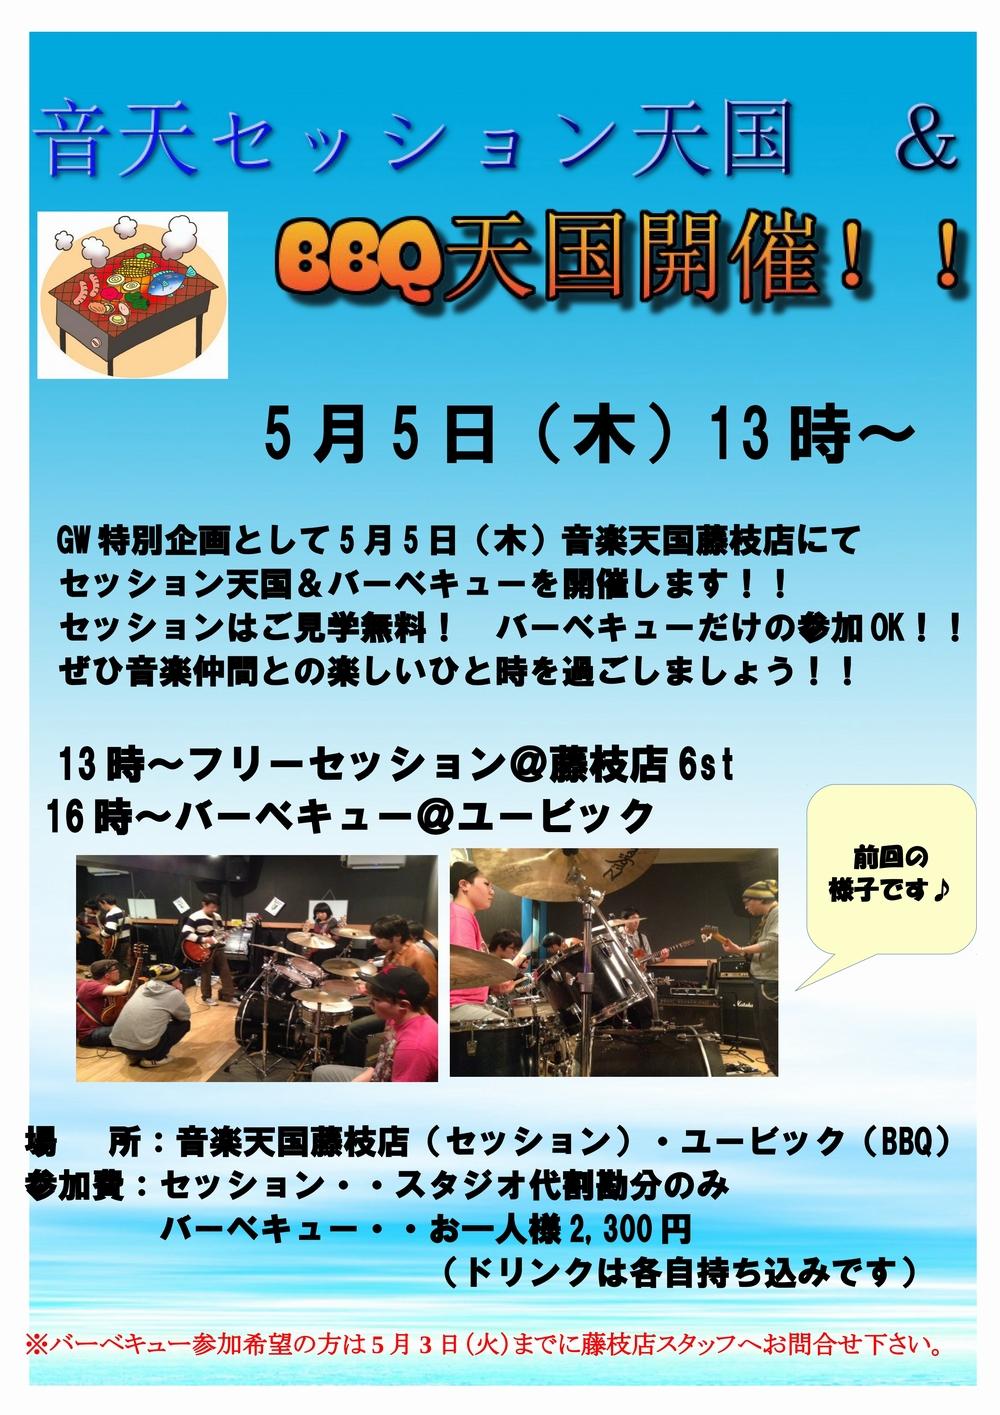 【セッション天国&BBQ天国】音楽天国・藤枝店5月5日(木)開催